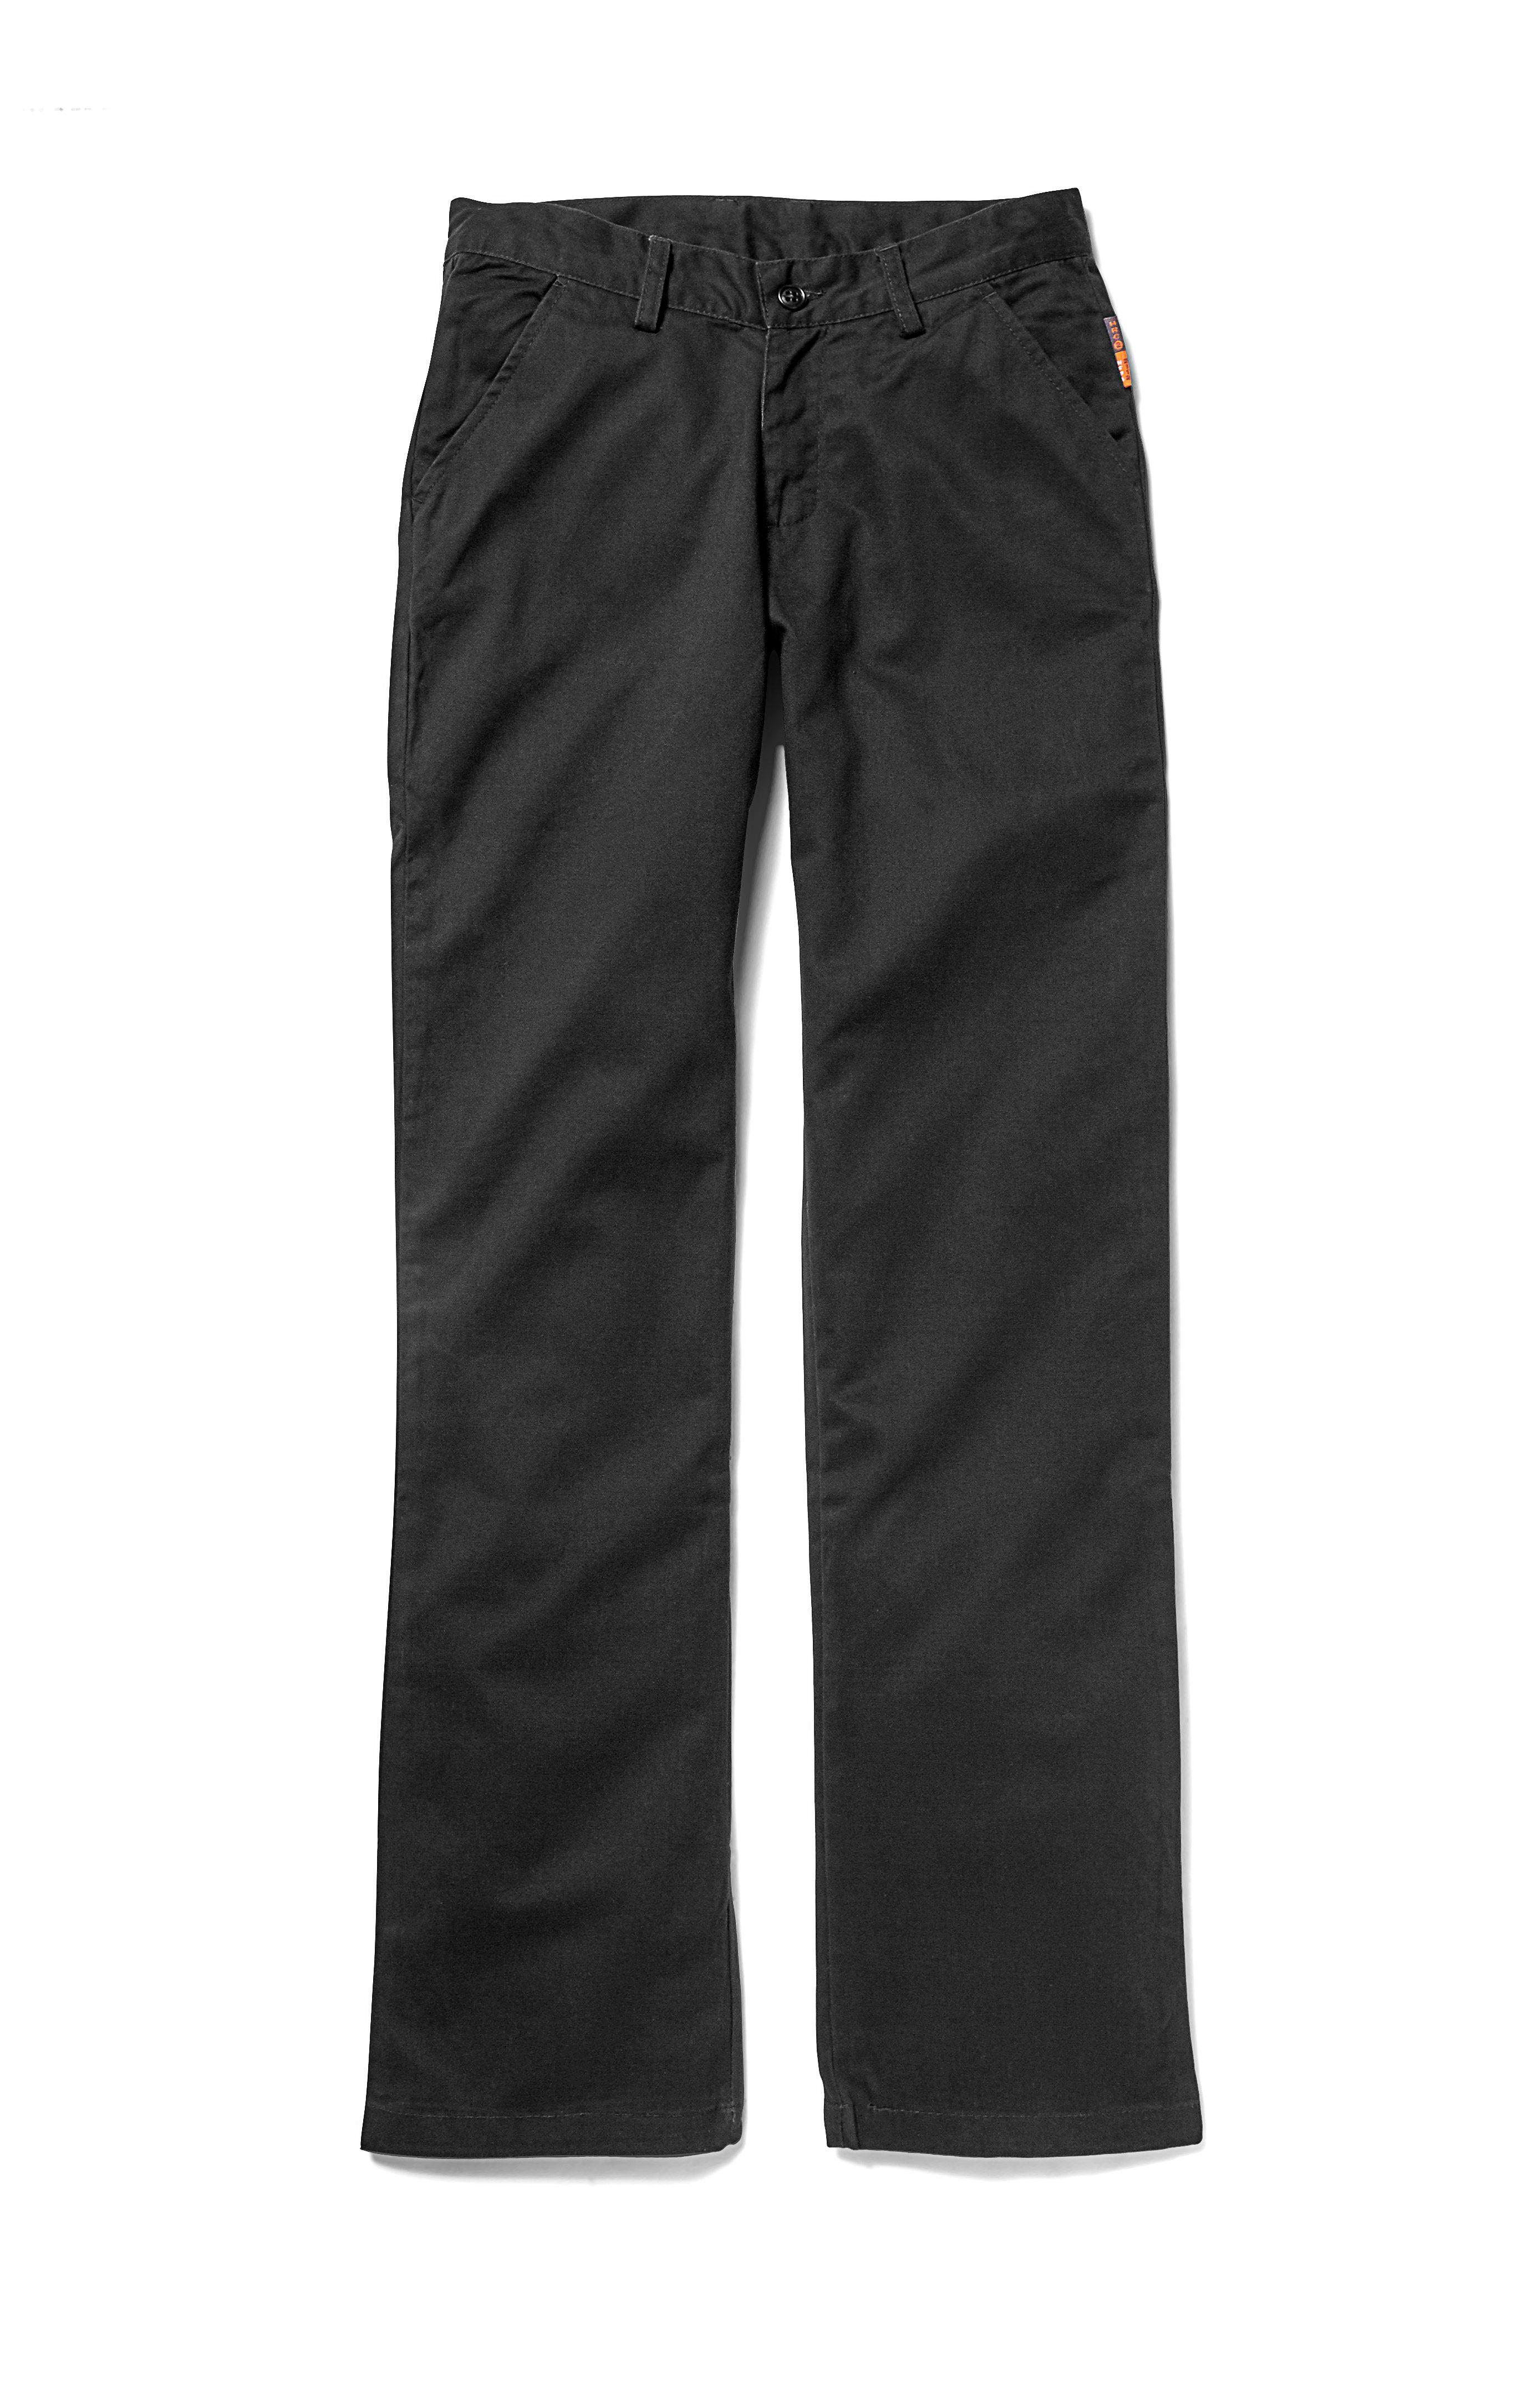 FR GlenGuard Uniform Pants